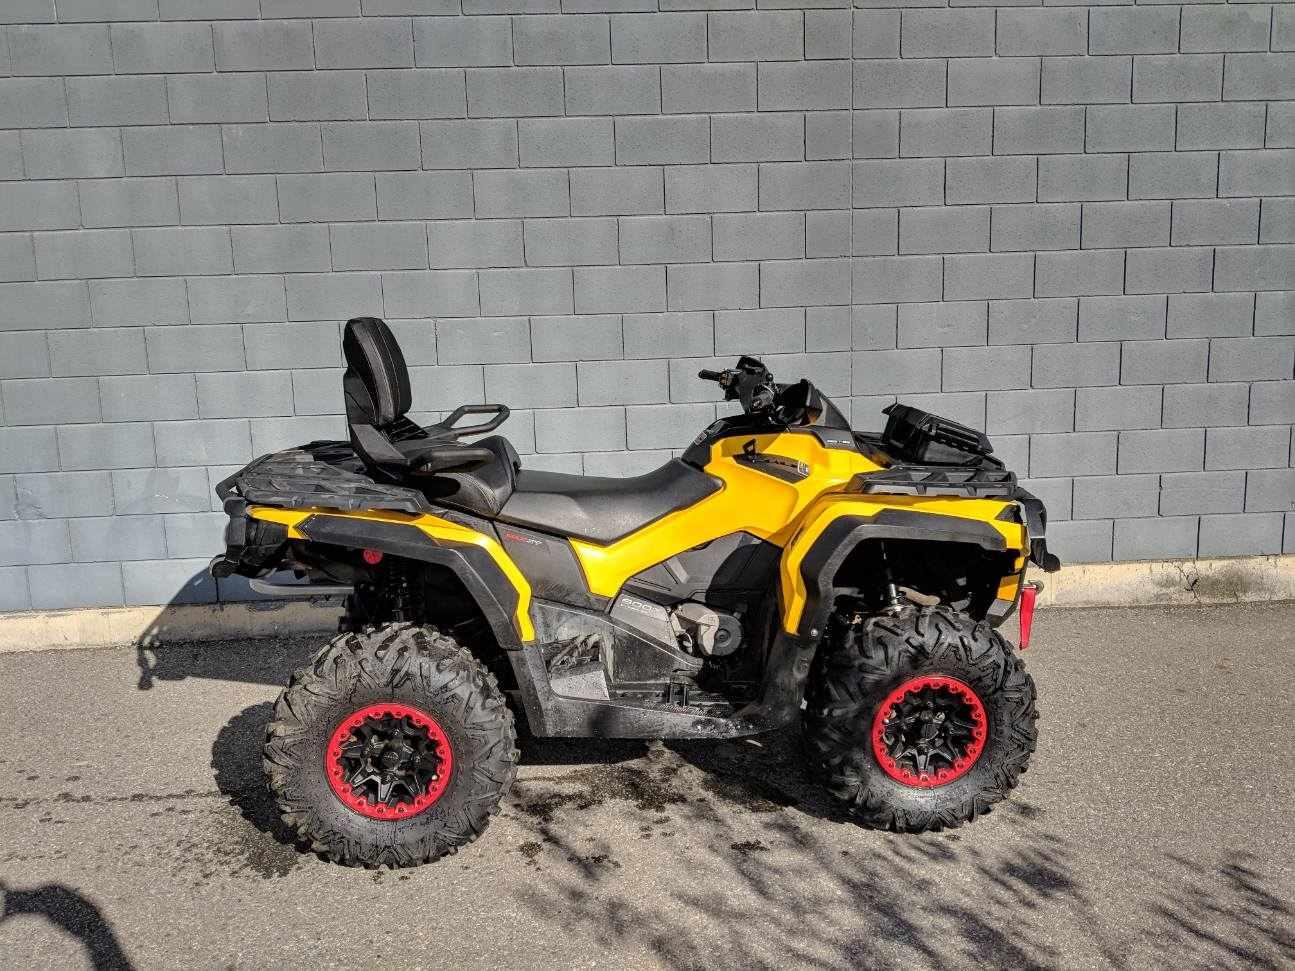 2013 Can-Am ATV Outlander Max Xt 800